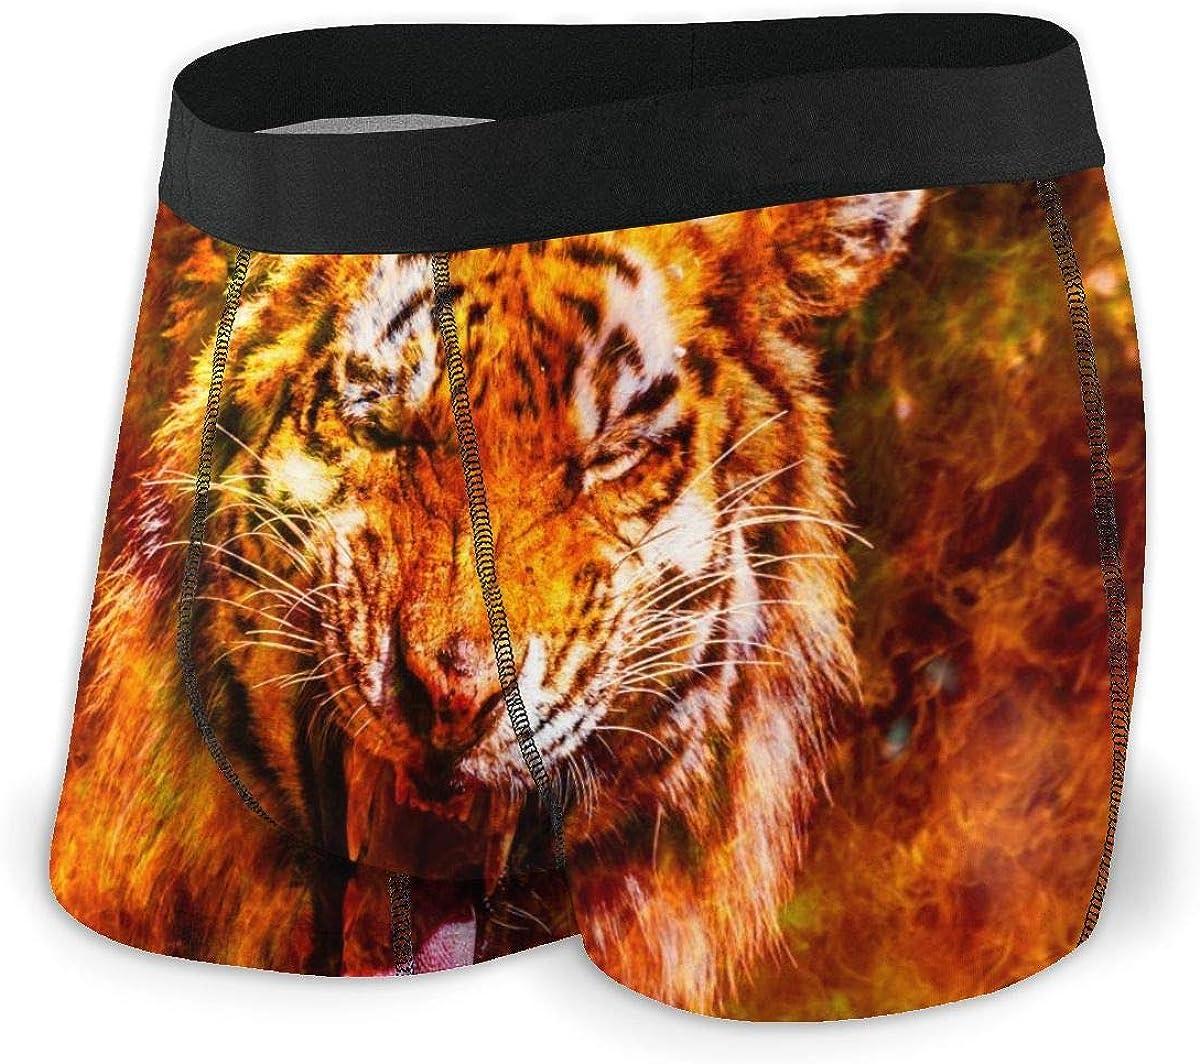 Mens Boxer Briefs Wonderful Tiger in Fire Breathable Underwear